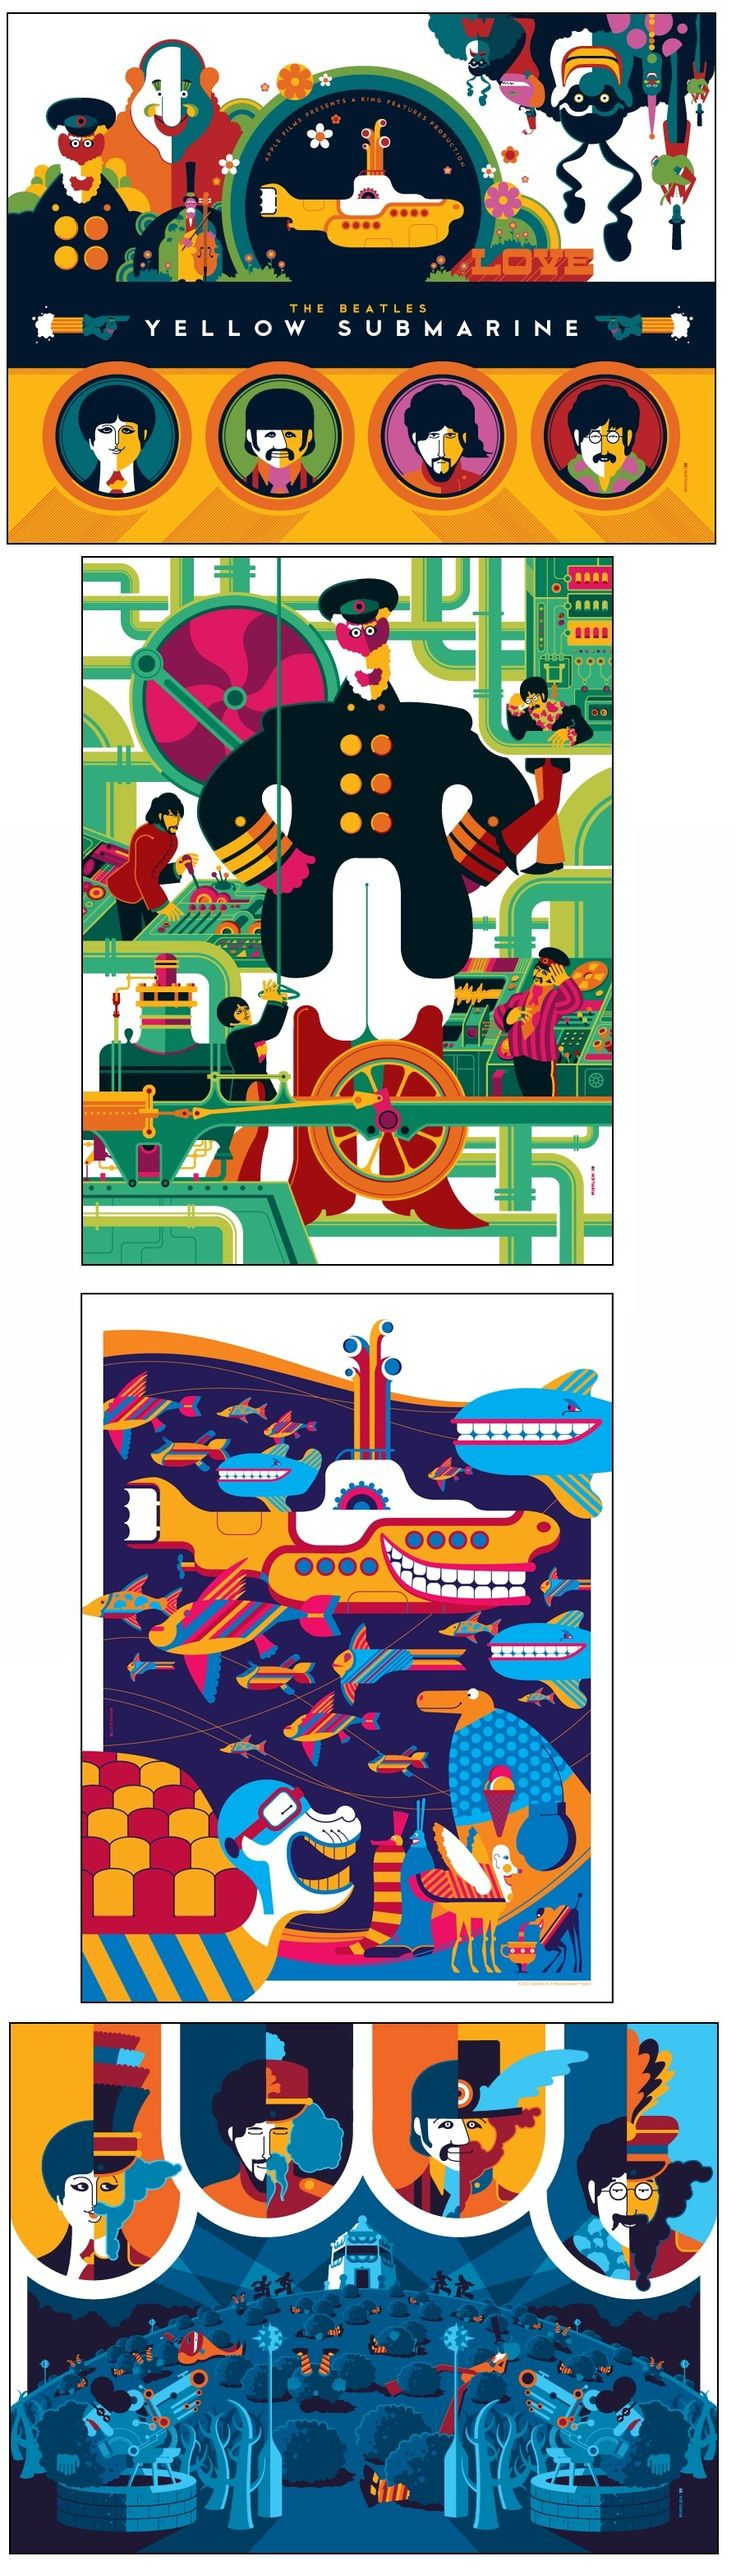 beatles-yellow-submarine-poster